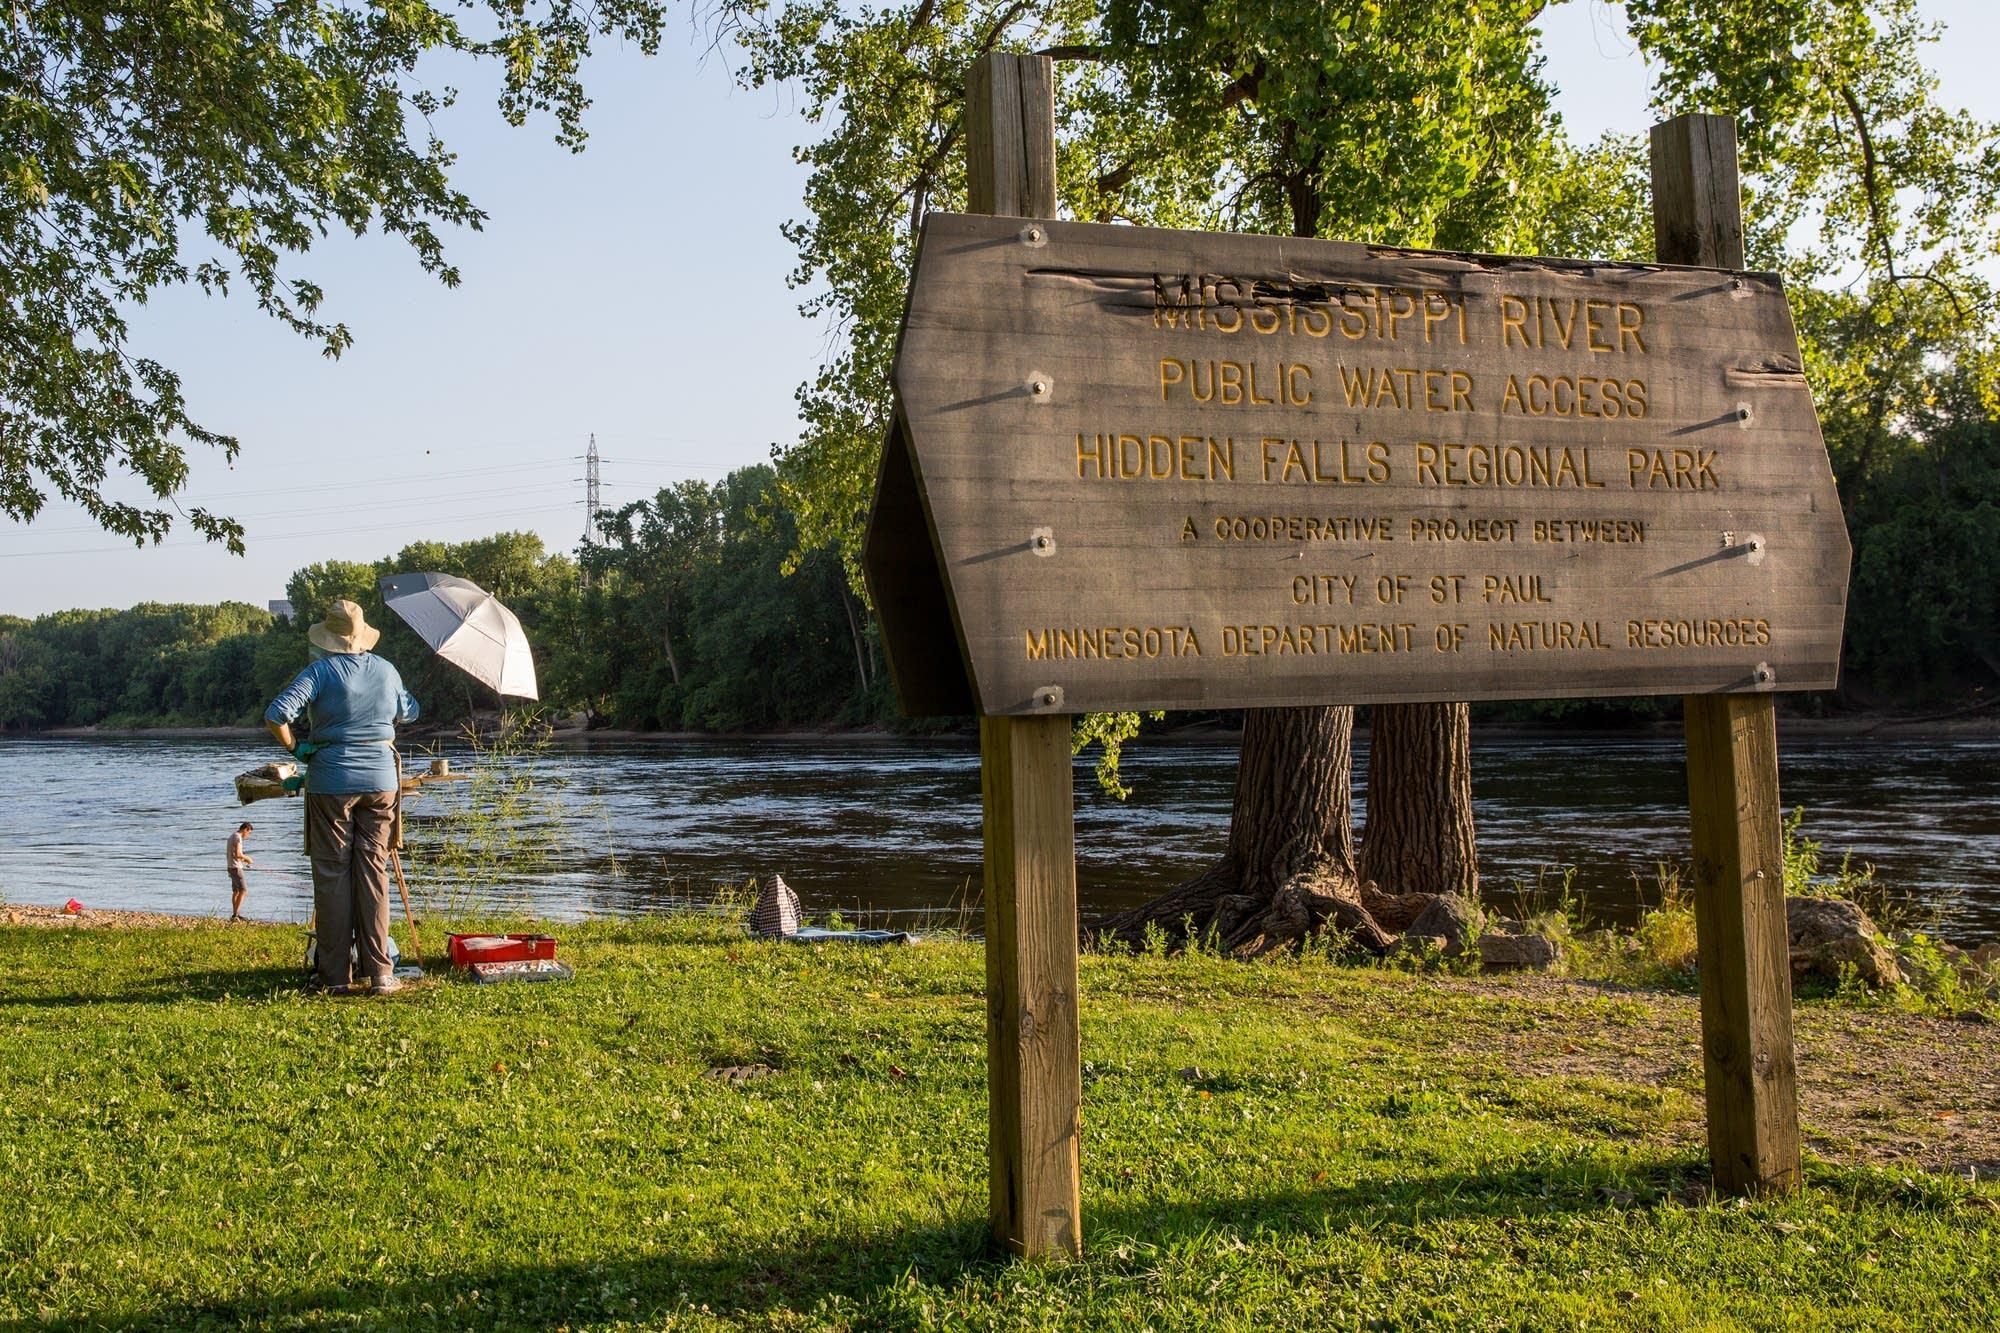 A painter at Hidden Falls Regional Park